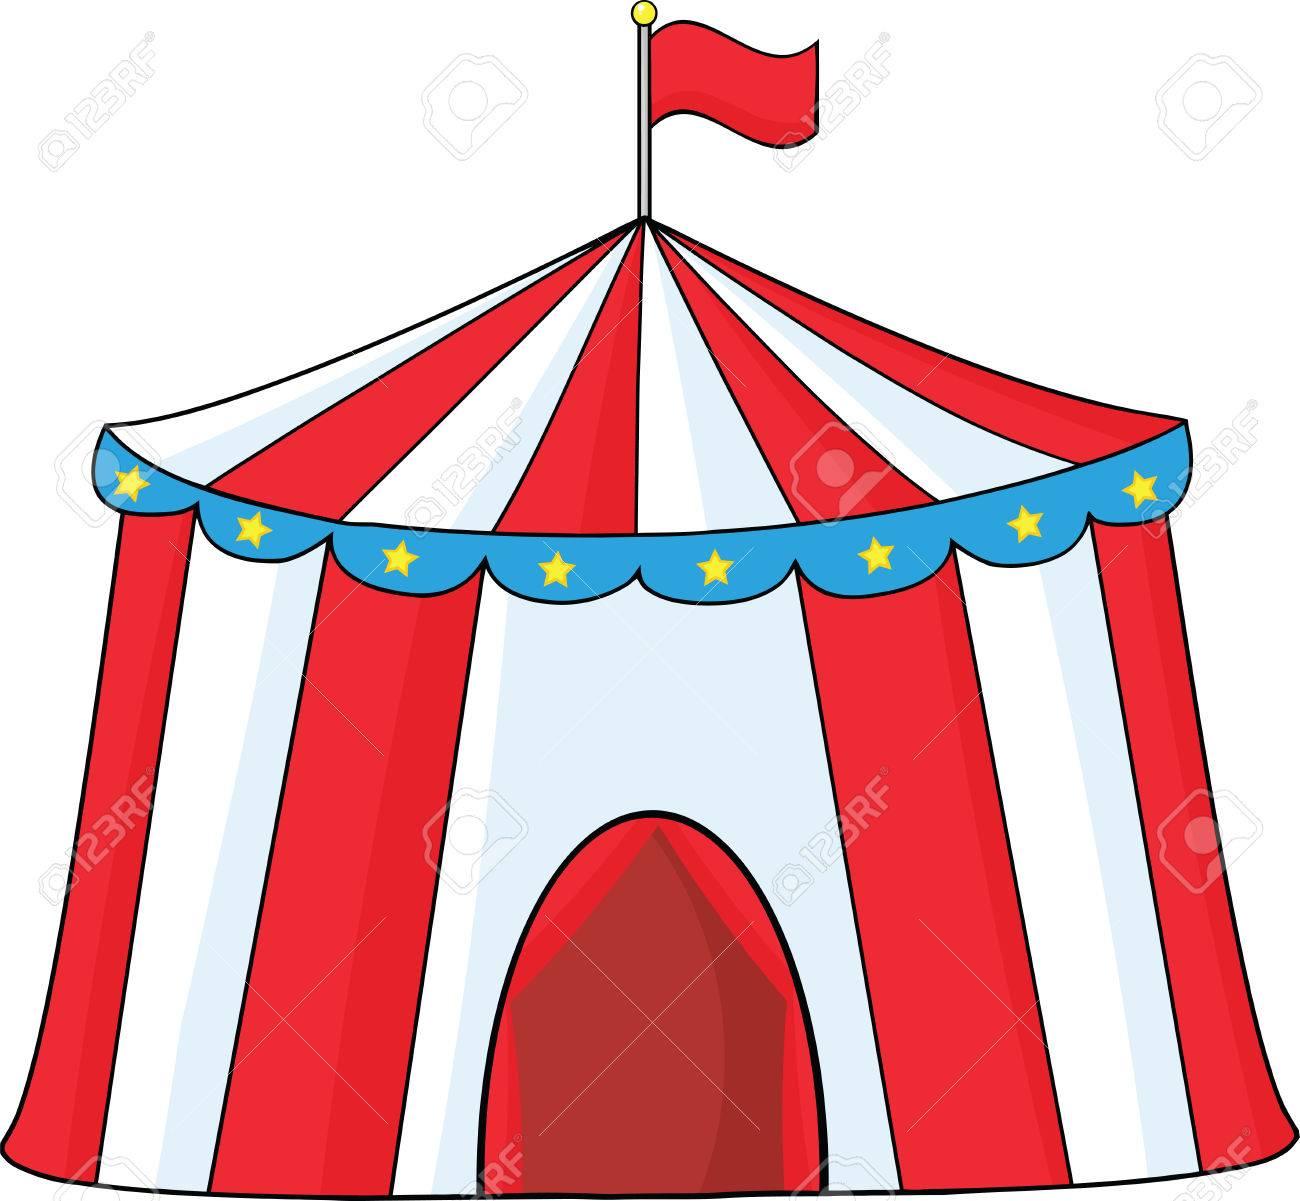 Old Circus Tent Best 2017  sc 1 st  Best Tent 2018 & Tent Illustration - Best Tent 2018